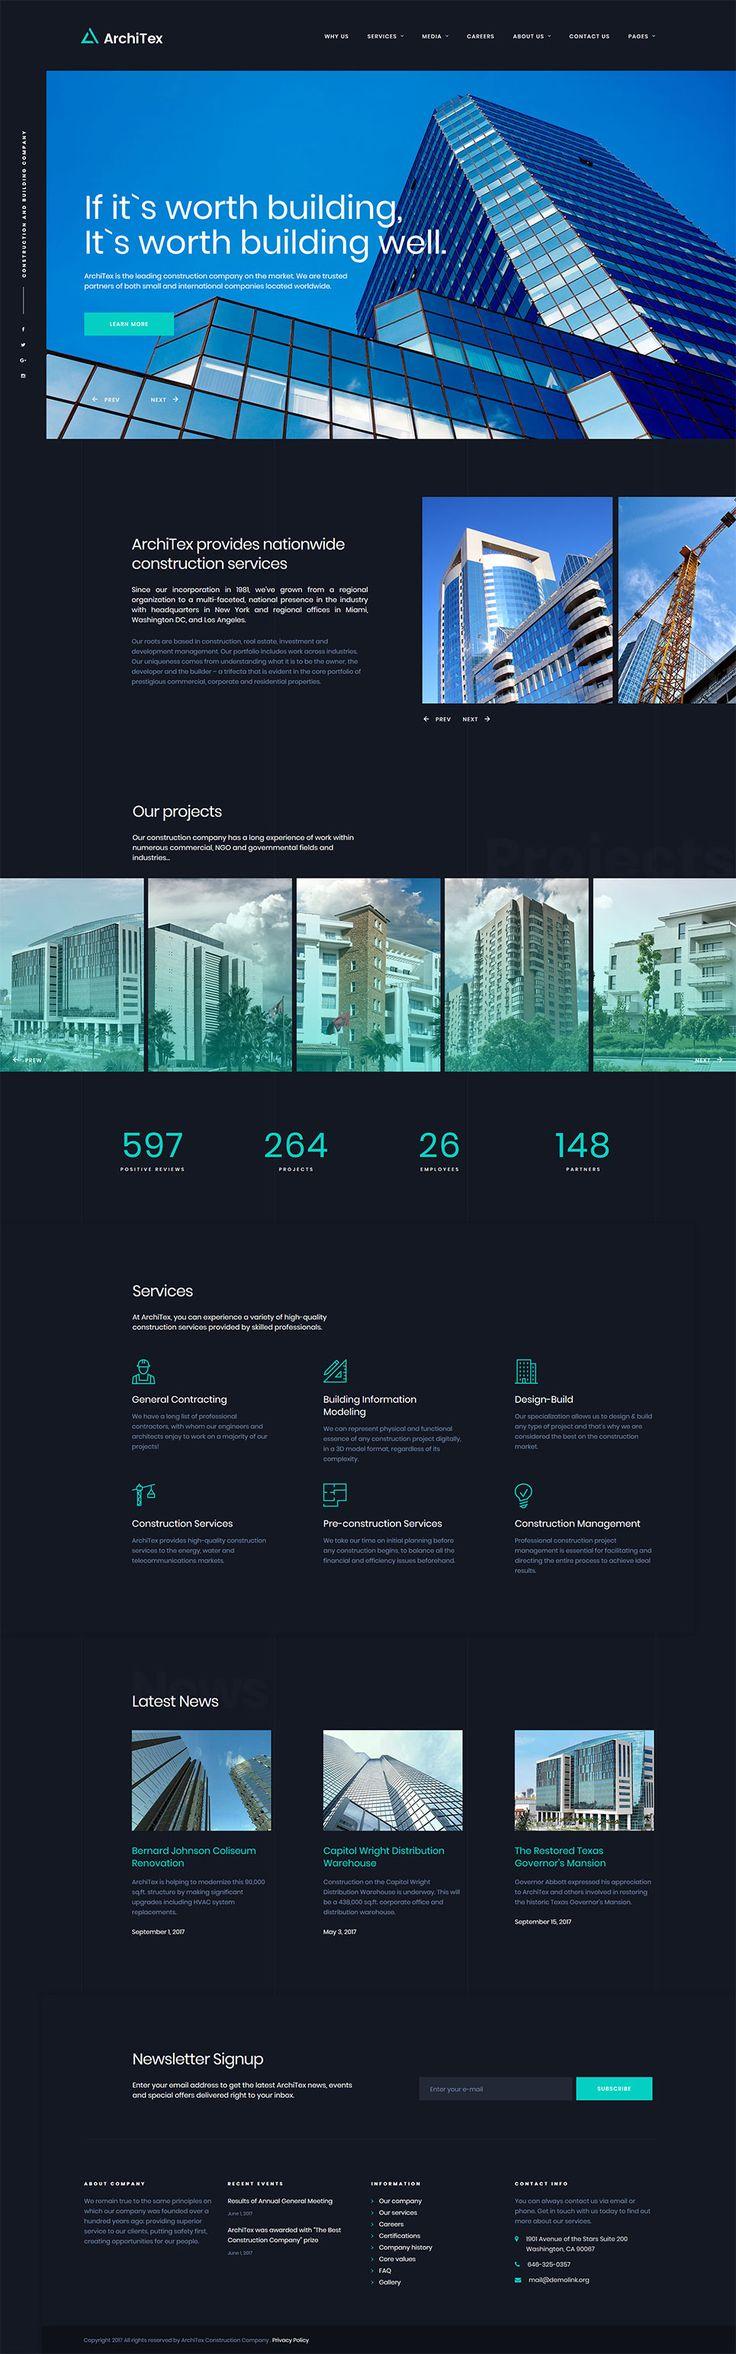 Architex Architecture Building Construction Responsive - Podcast website template